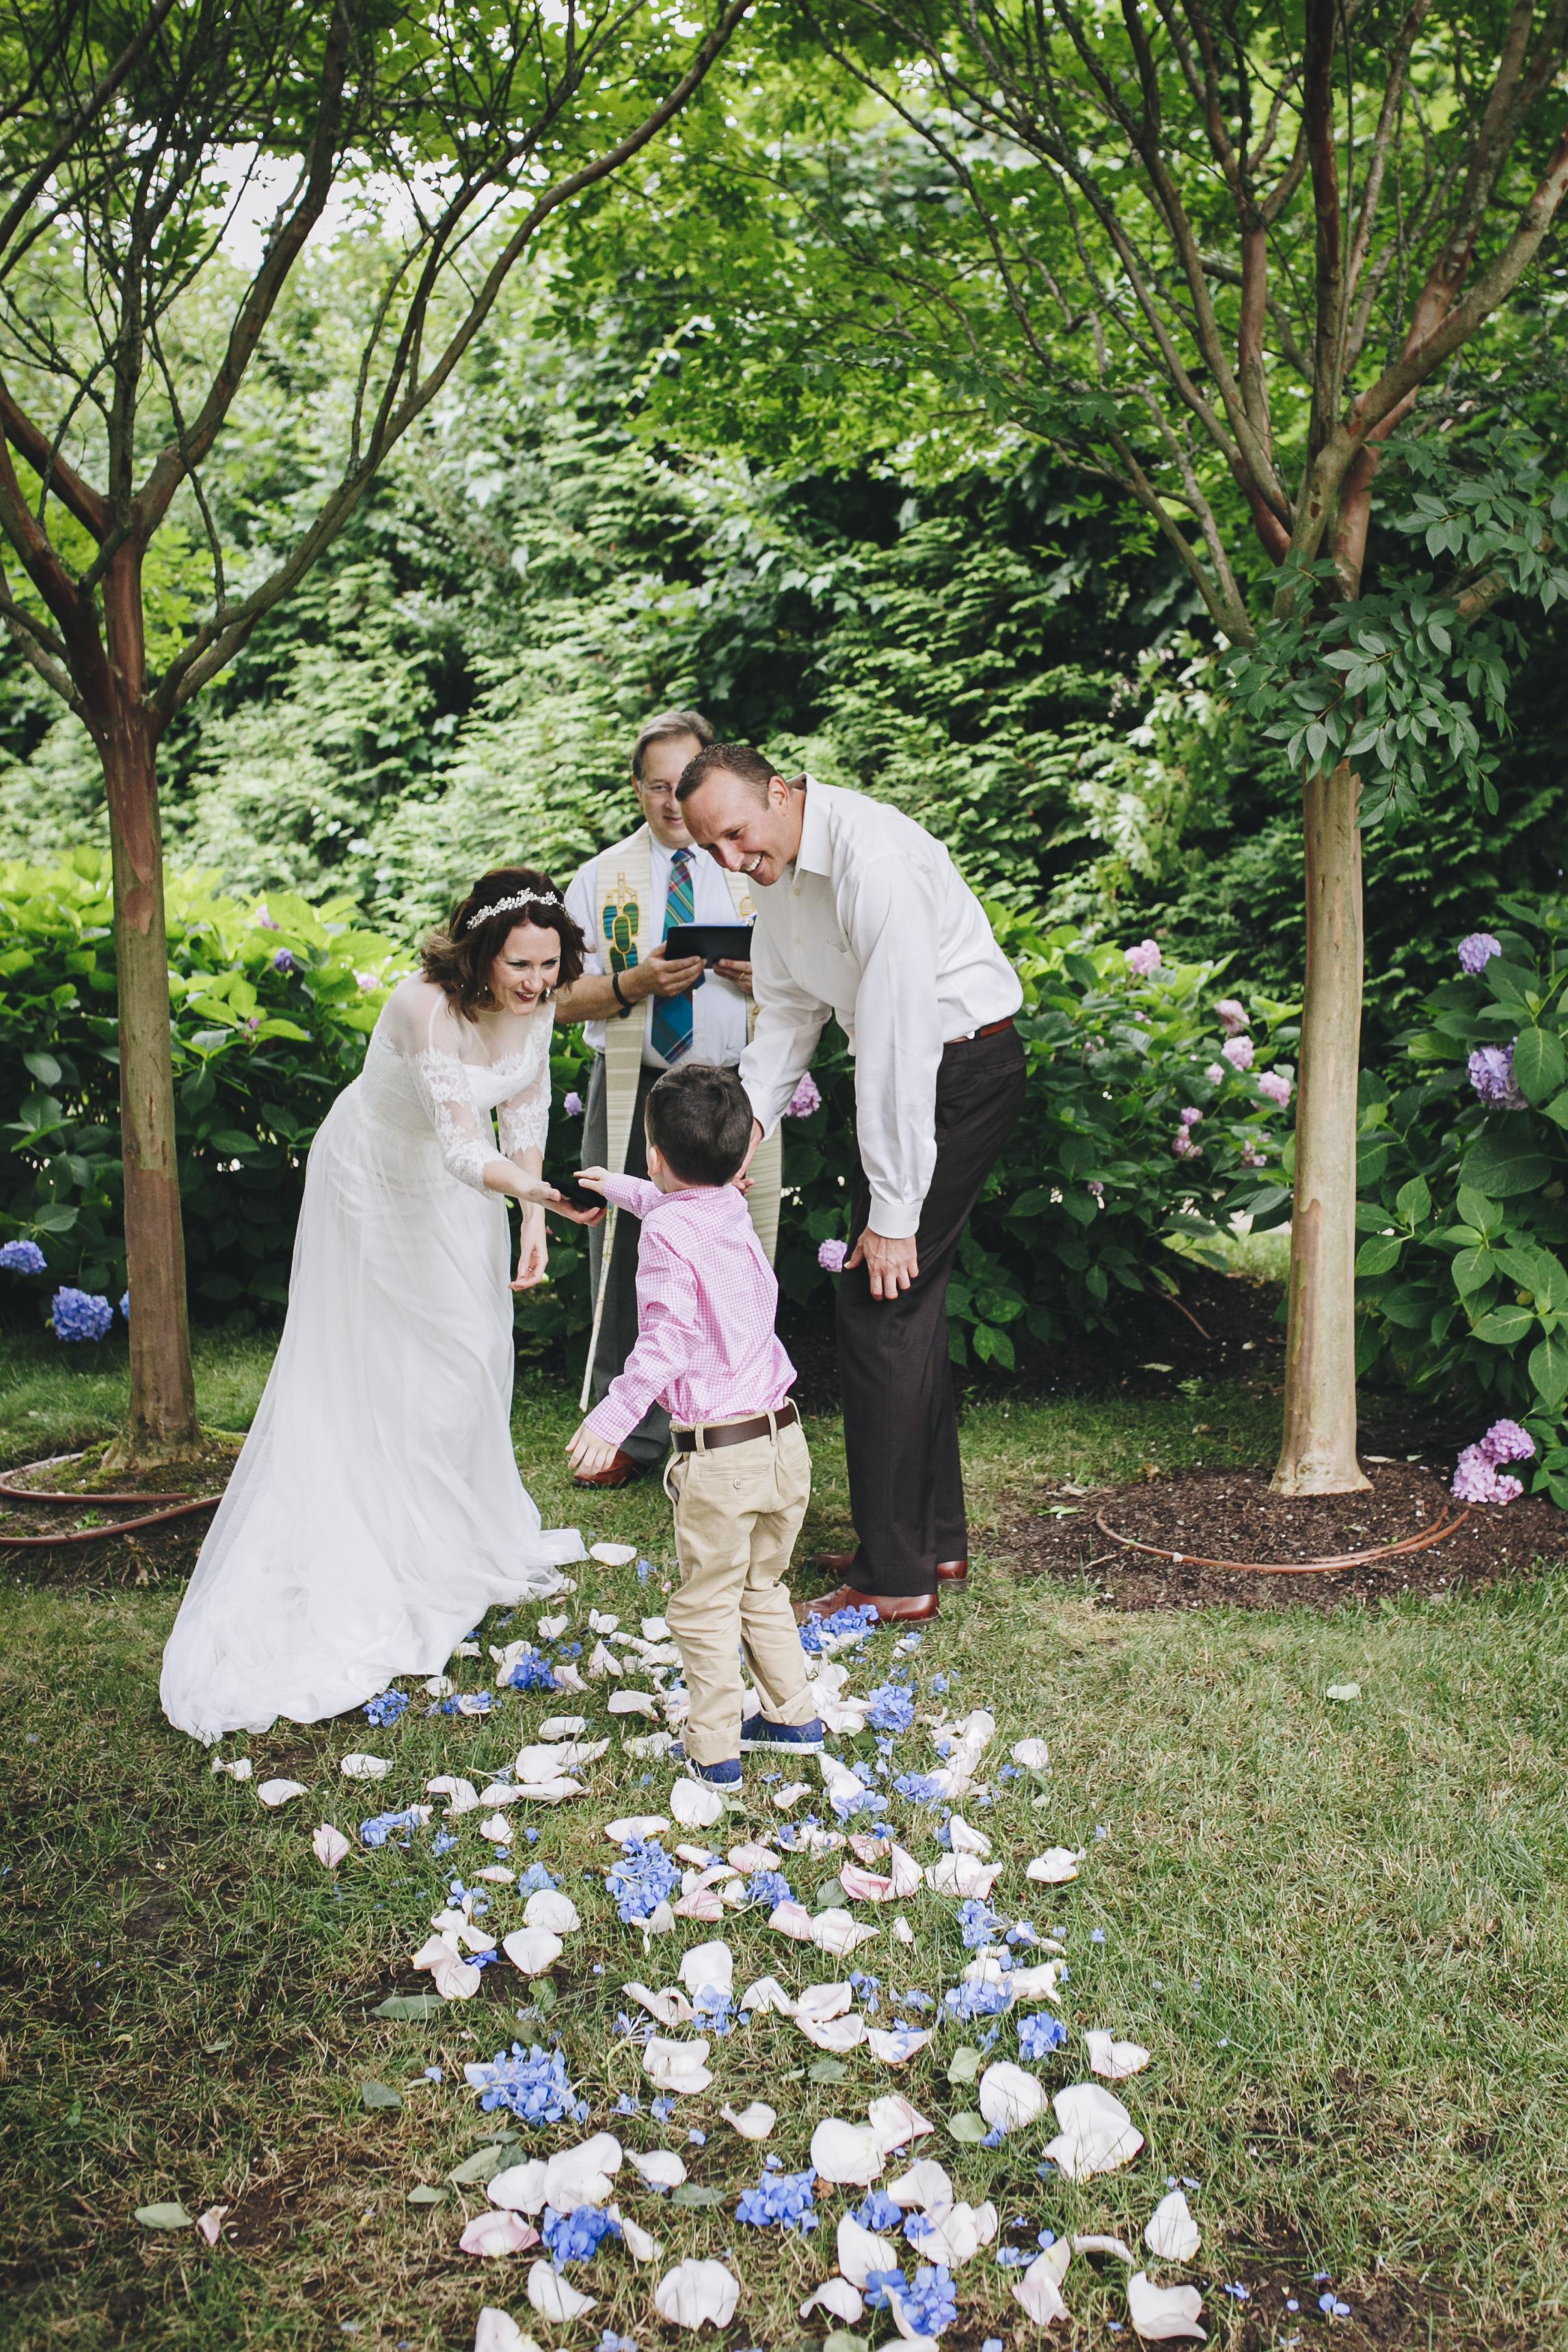 Audrey & Bryan wedding Bridgehampton Inn by Unveiled-Weddings.com